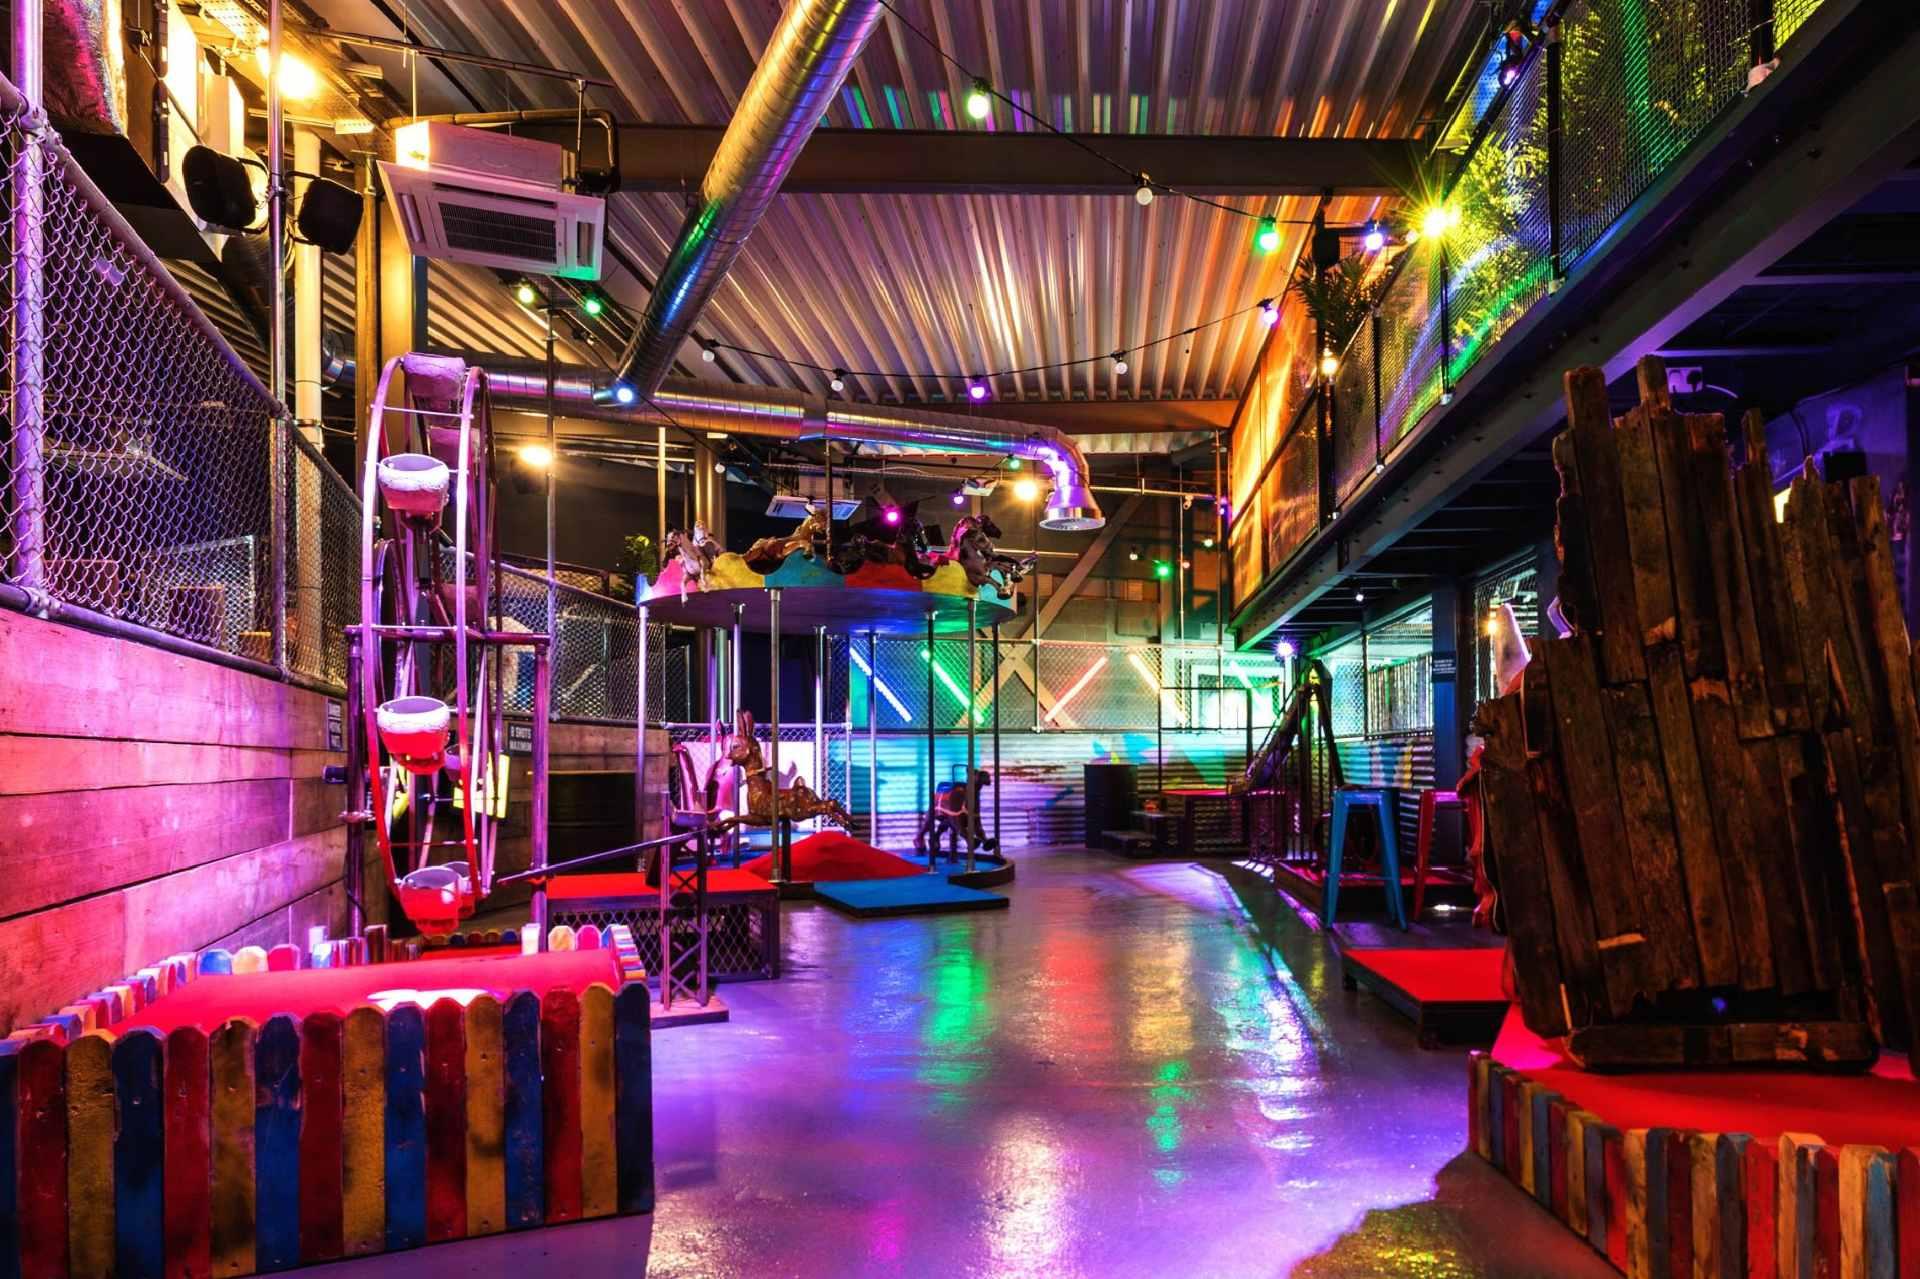 bozo-crazy-golf-course-at-junkyard-golf-club-indoor-activities-manchester